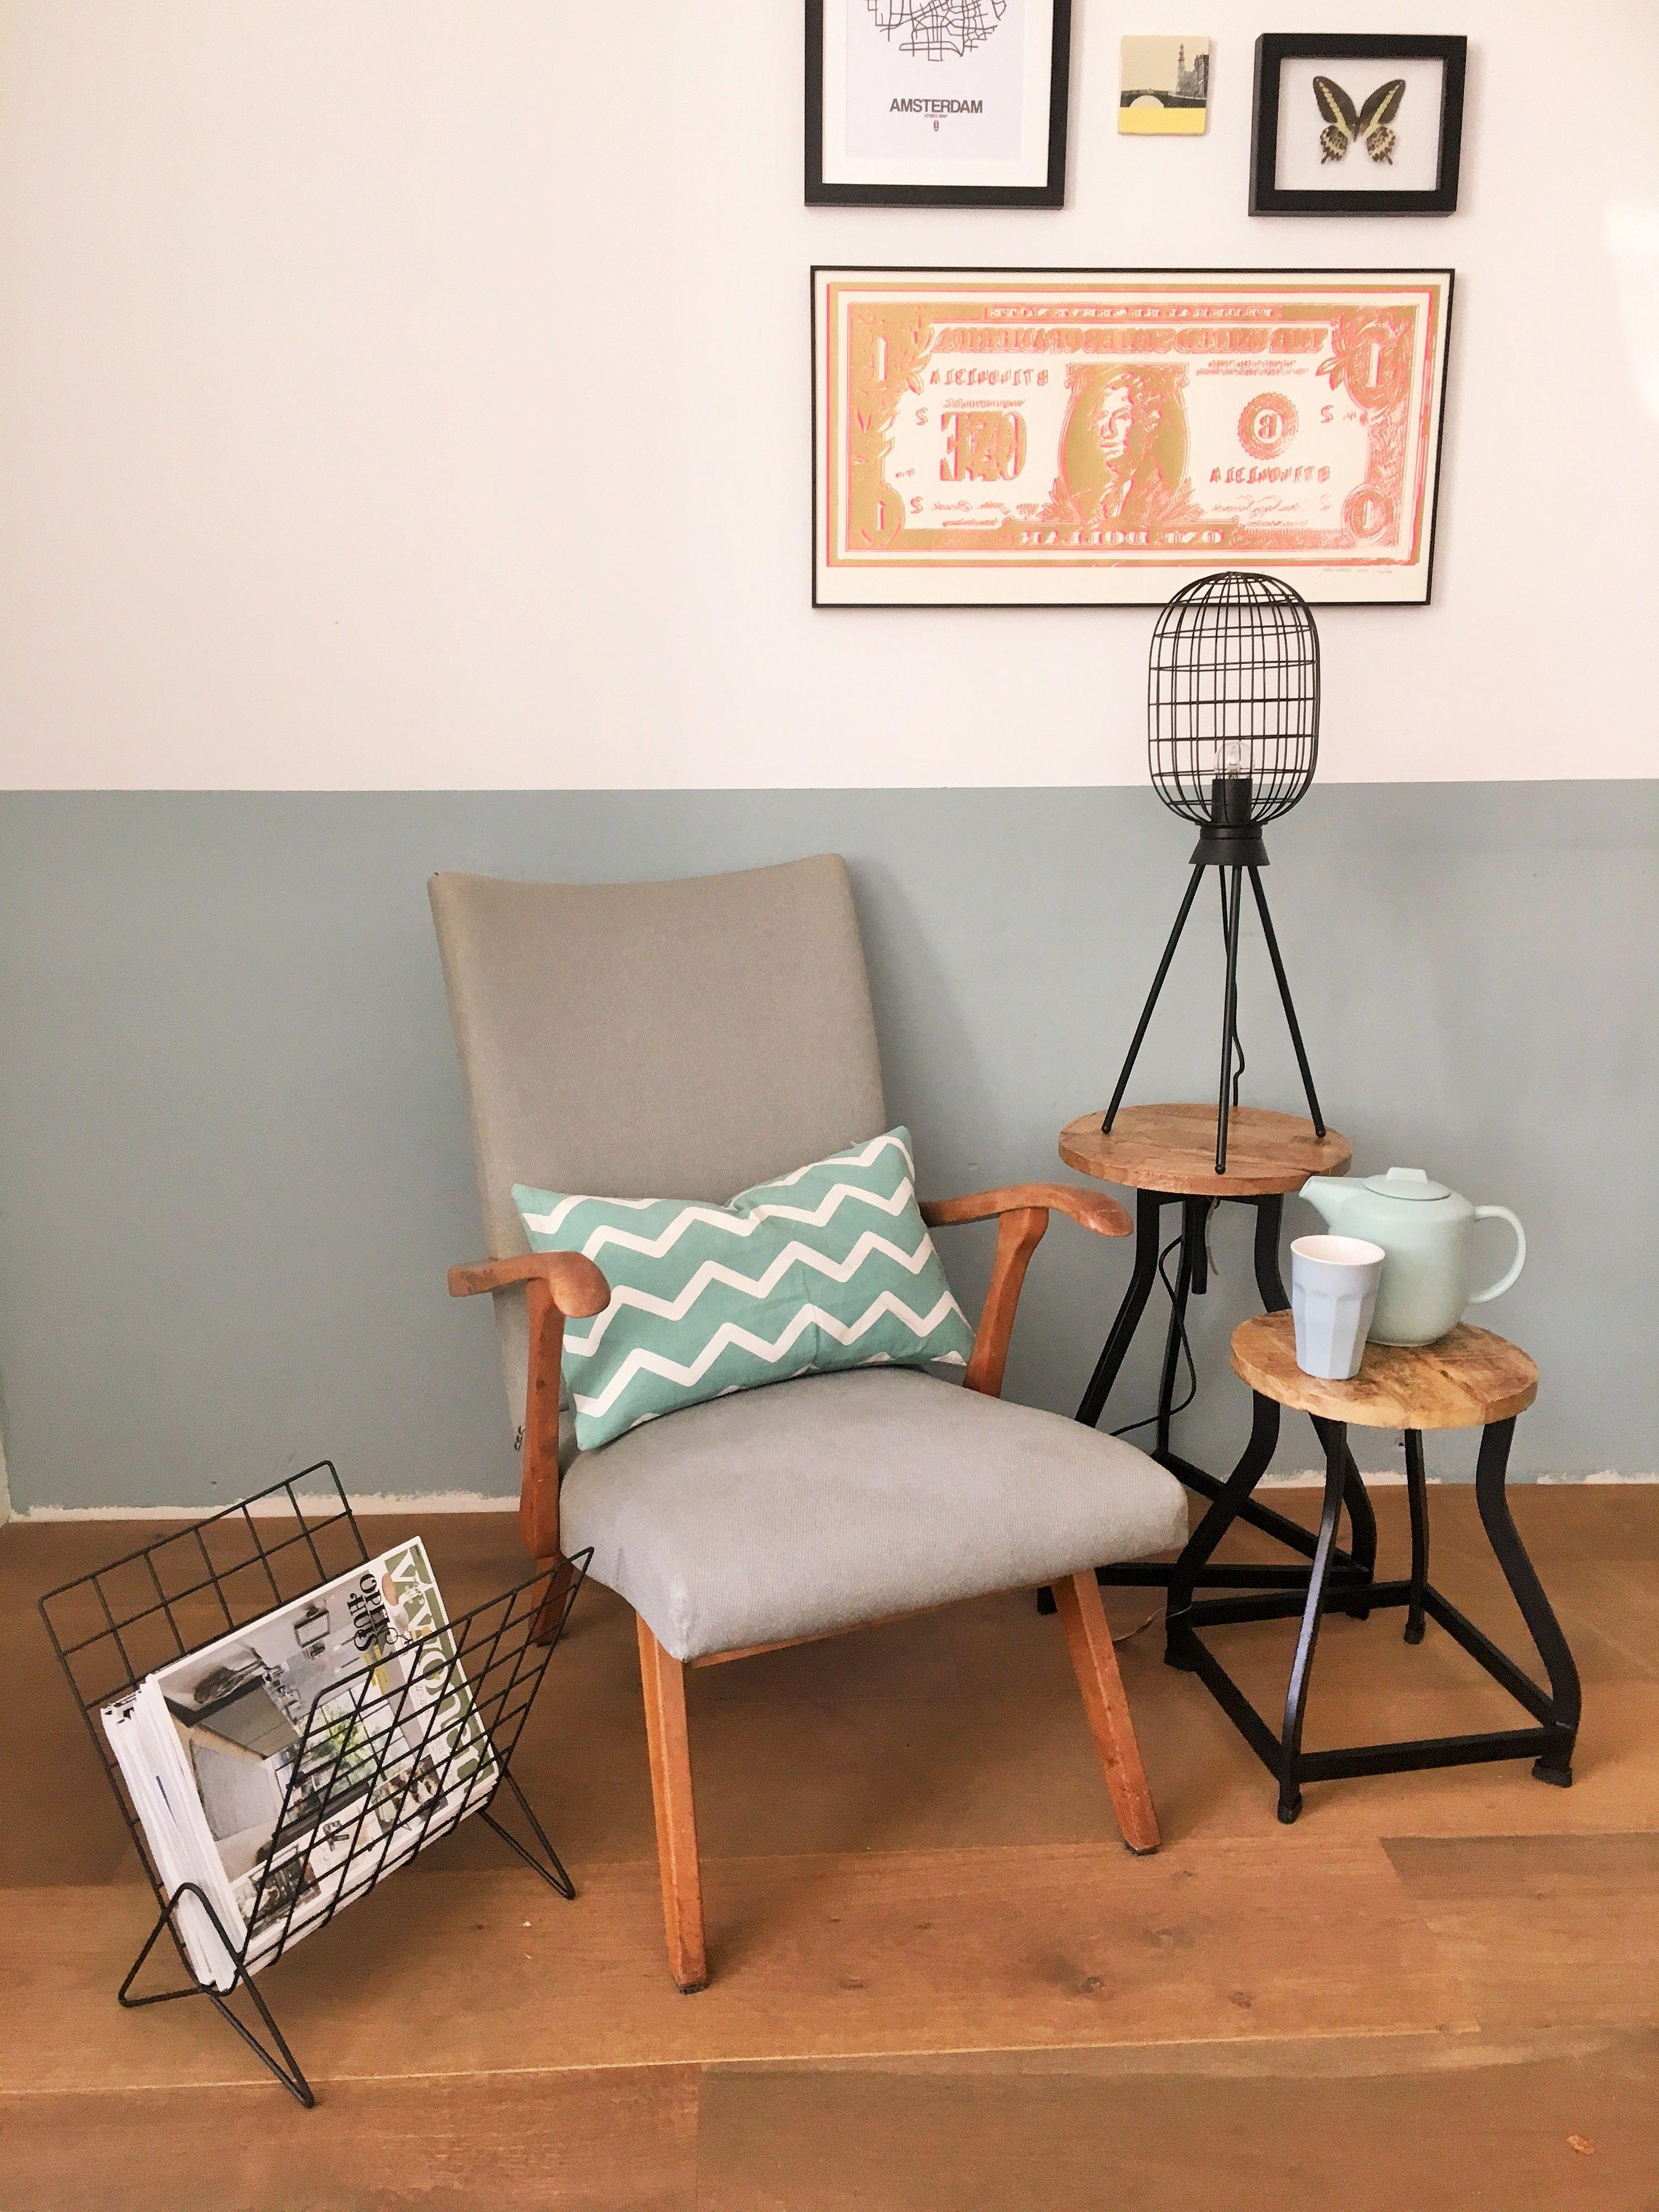 Stools from india housevitamininterior happy home furniture